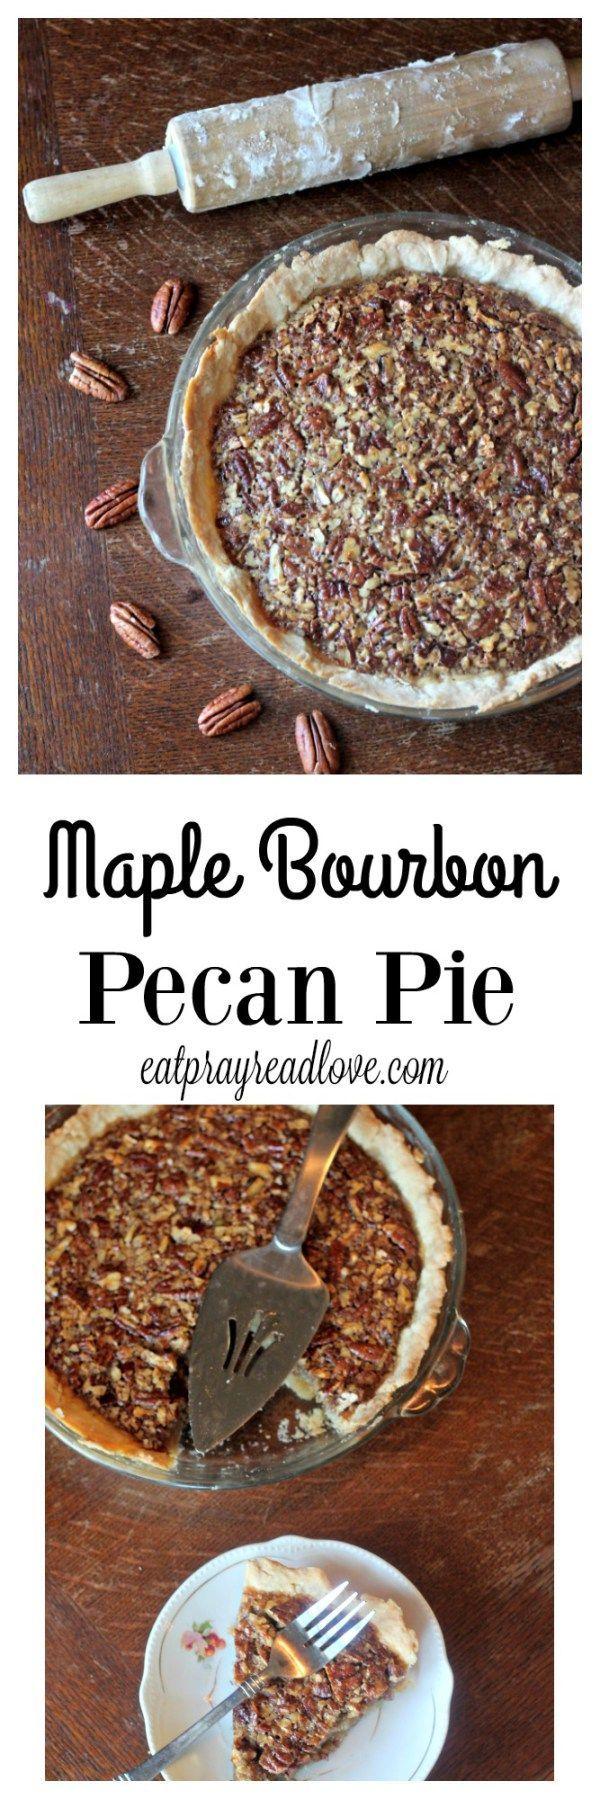 bourbon pecan pie maple bourbon pecan pie recipe pecan bourbon pie ...